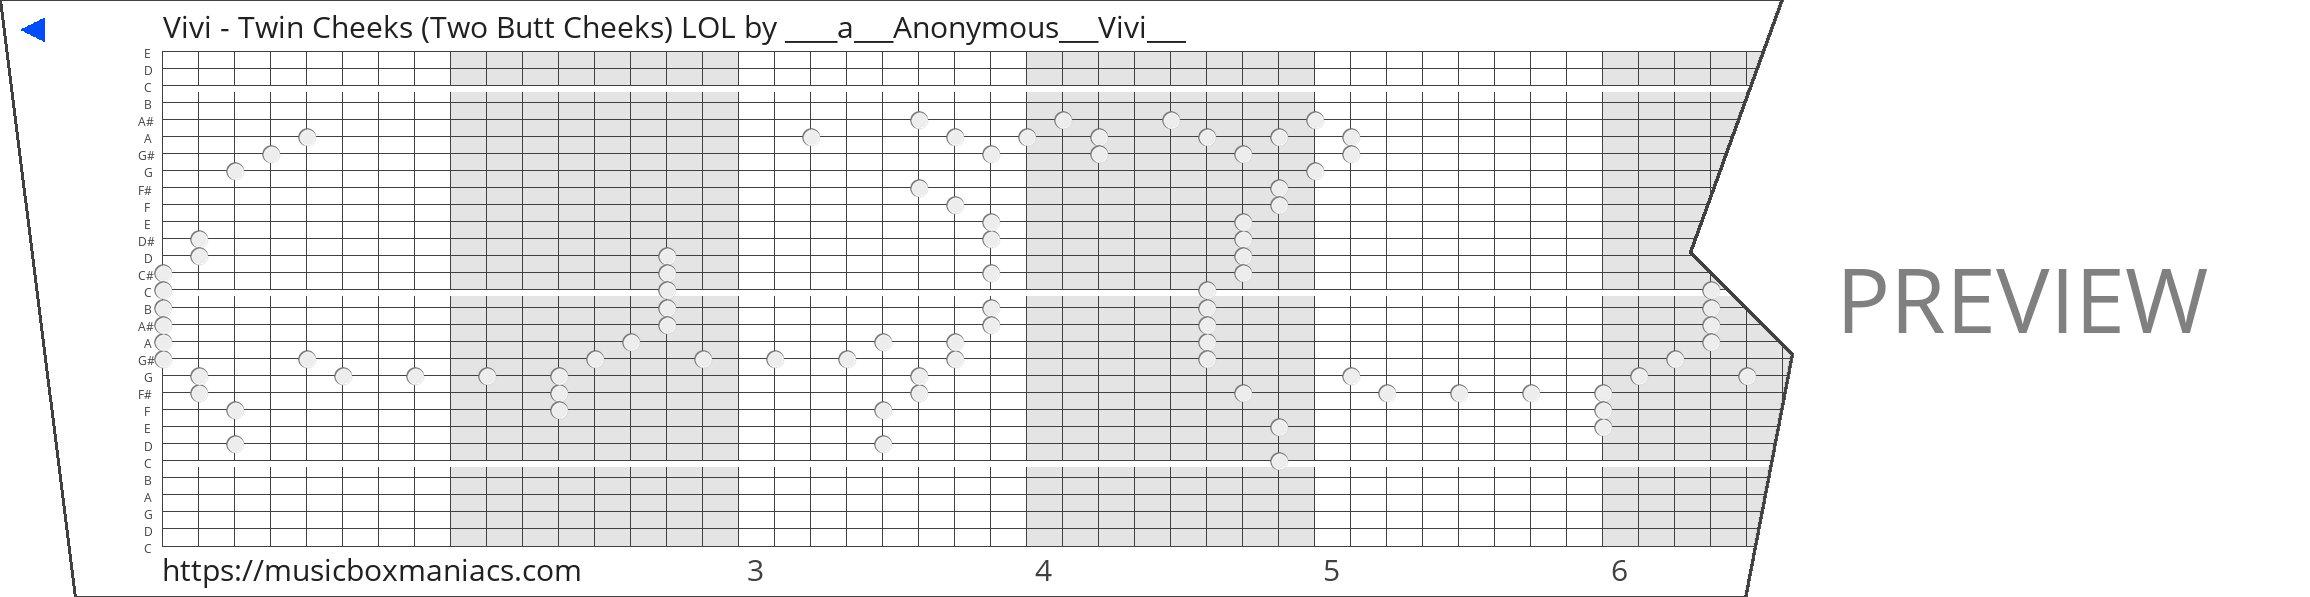 Vivi - Twin Cheeks (Two Butt Cheeks) LOL 30 note music box paper strip